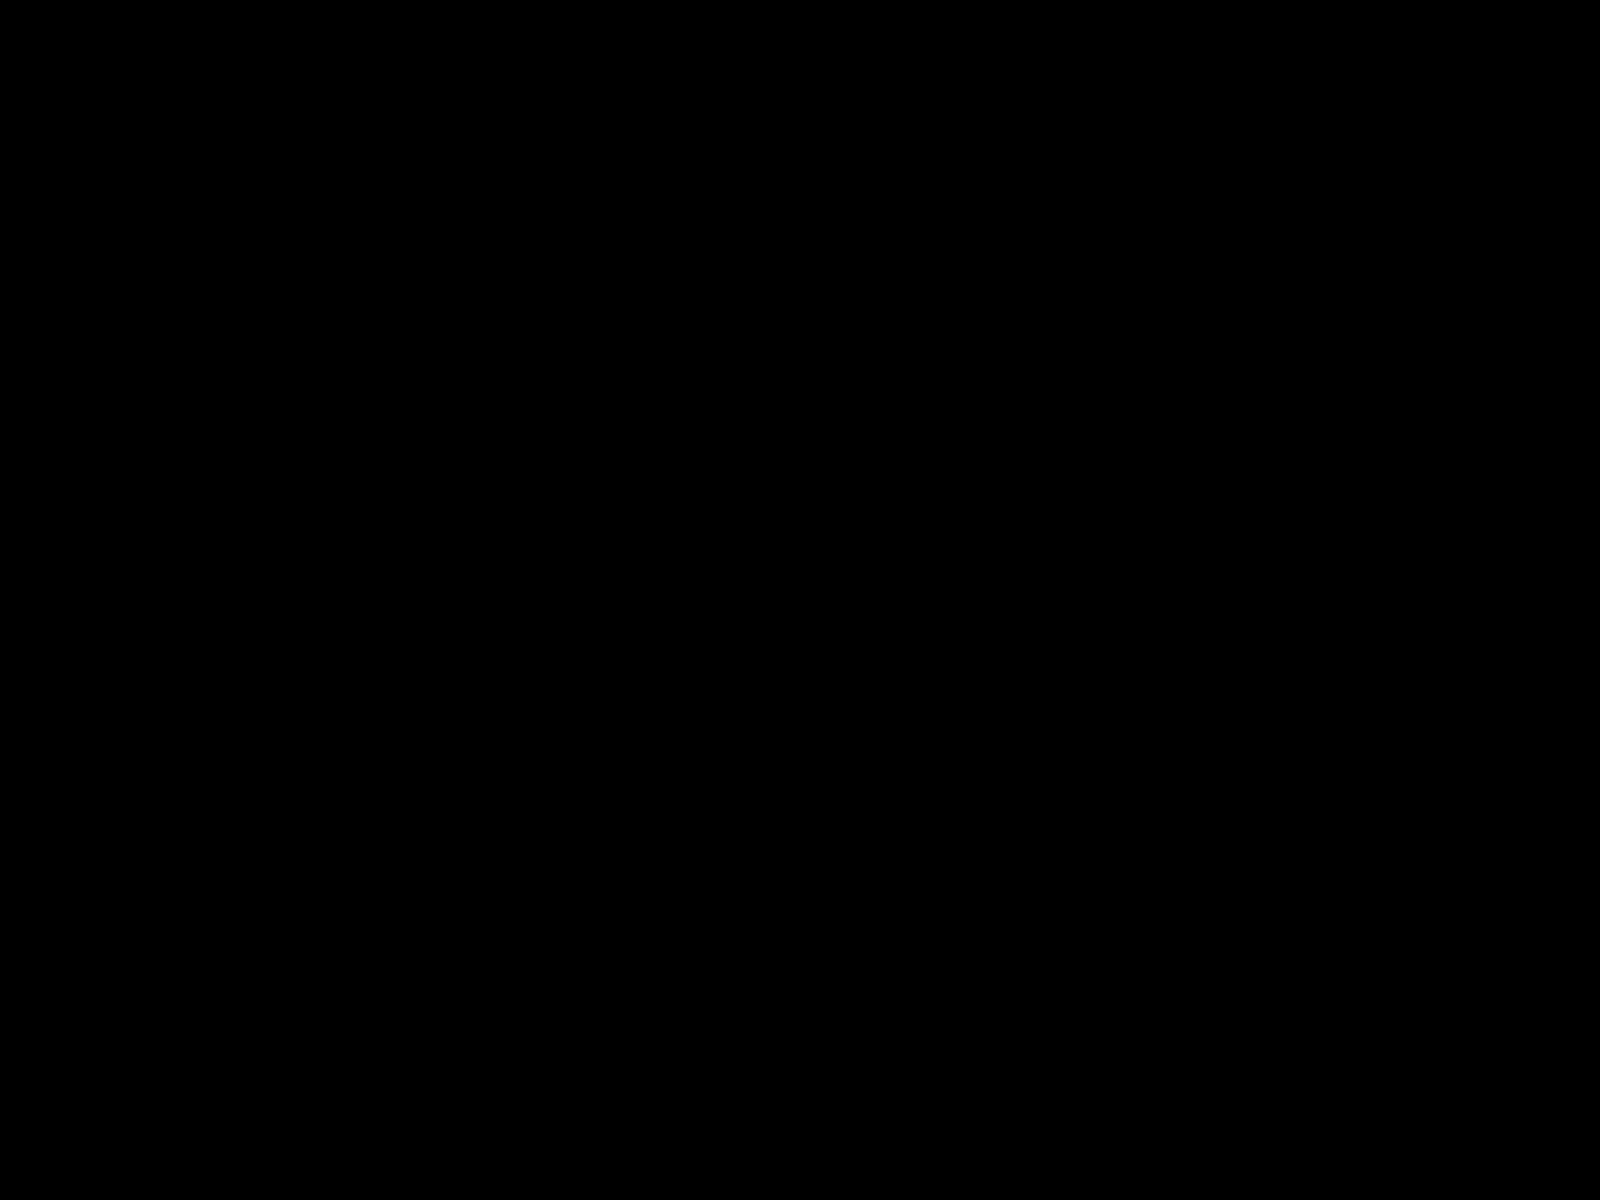 airbnb-logo-black-transparent